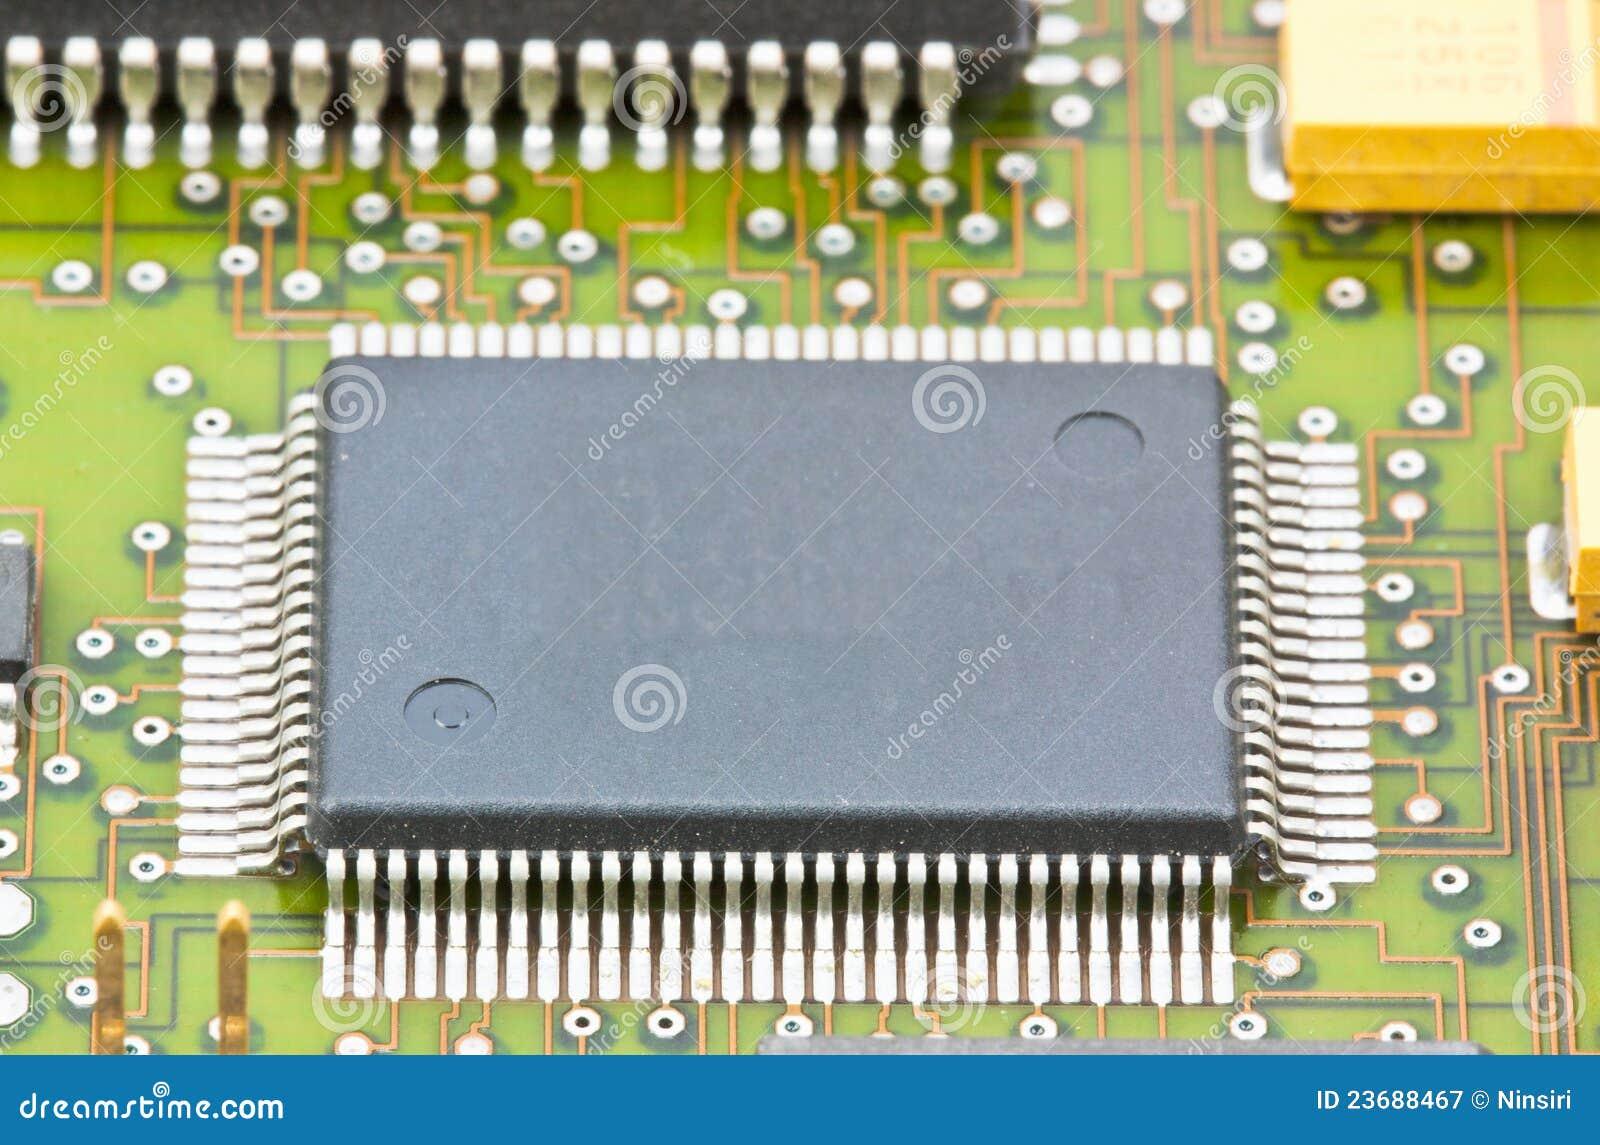 Java Based Circuit Simulator Http Wwwfalstadcom Circuit